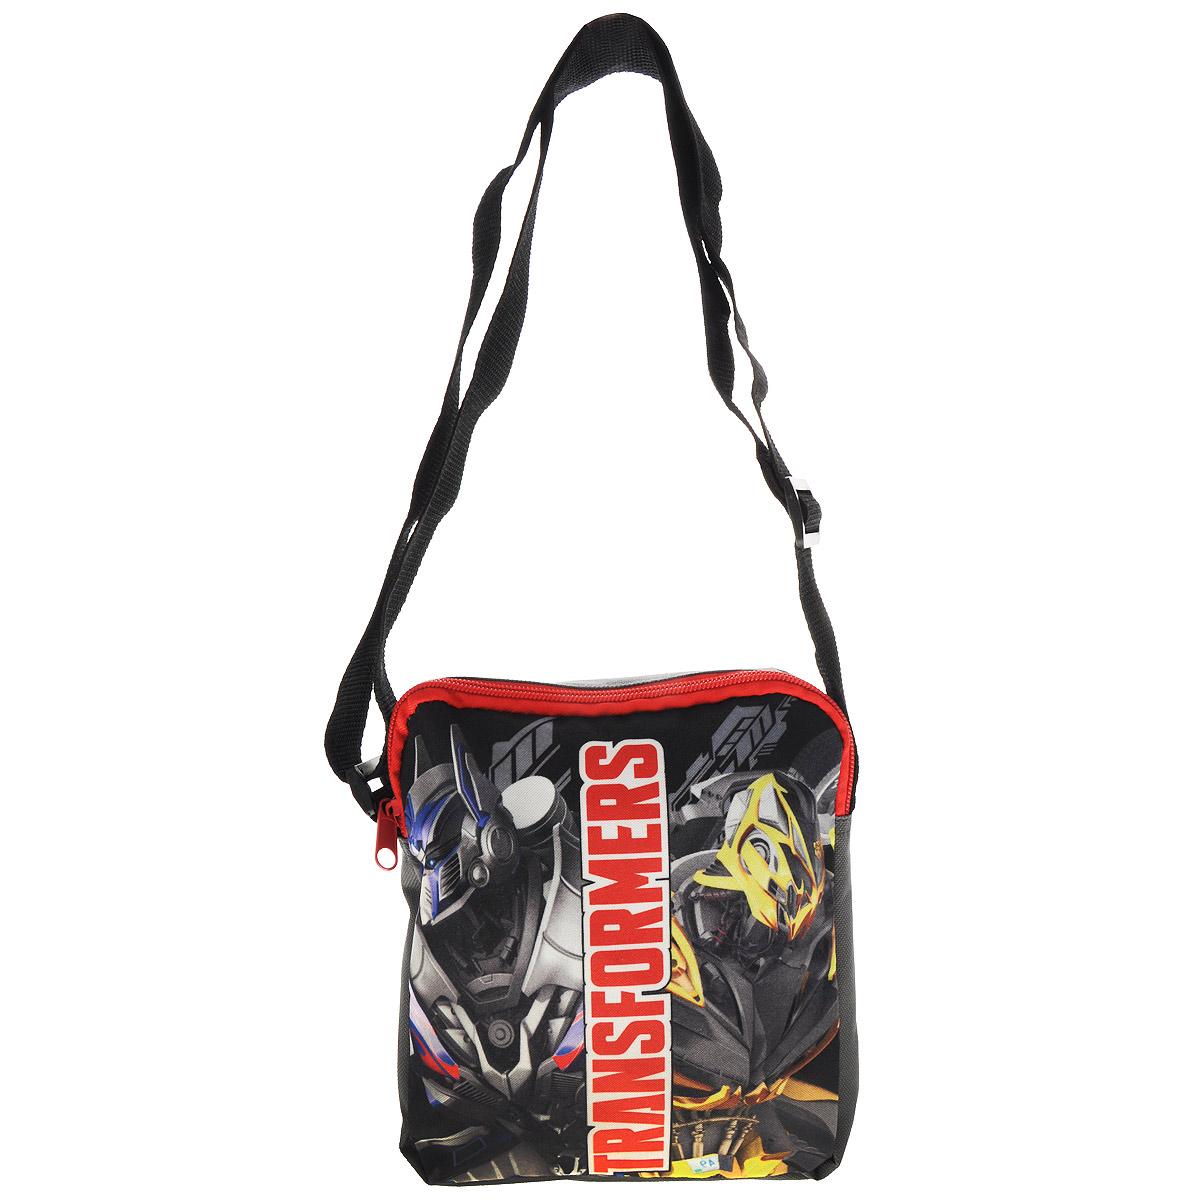 Сумка детская на плечо Transformers Prime, цвет: серый